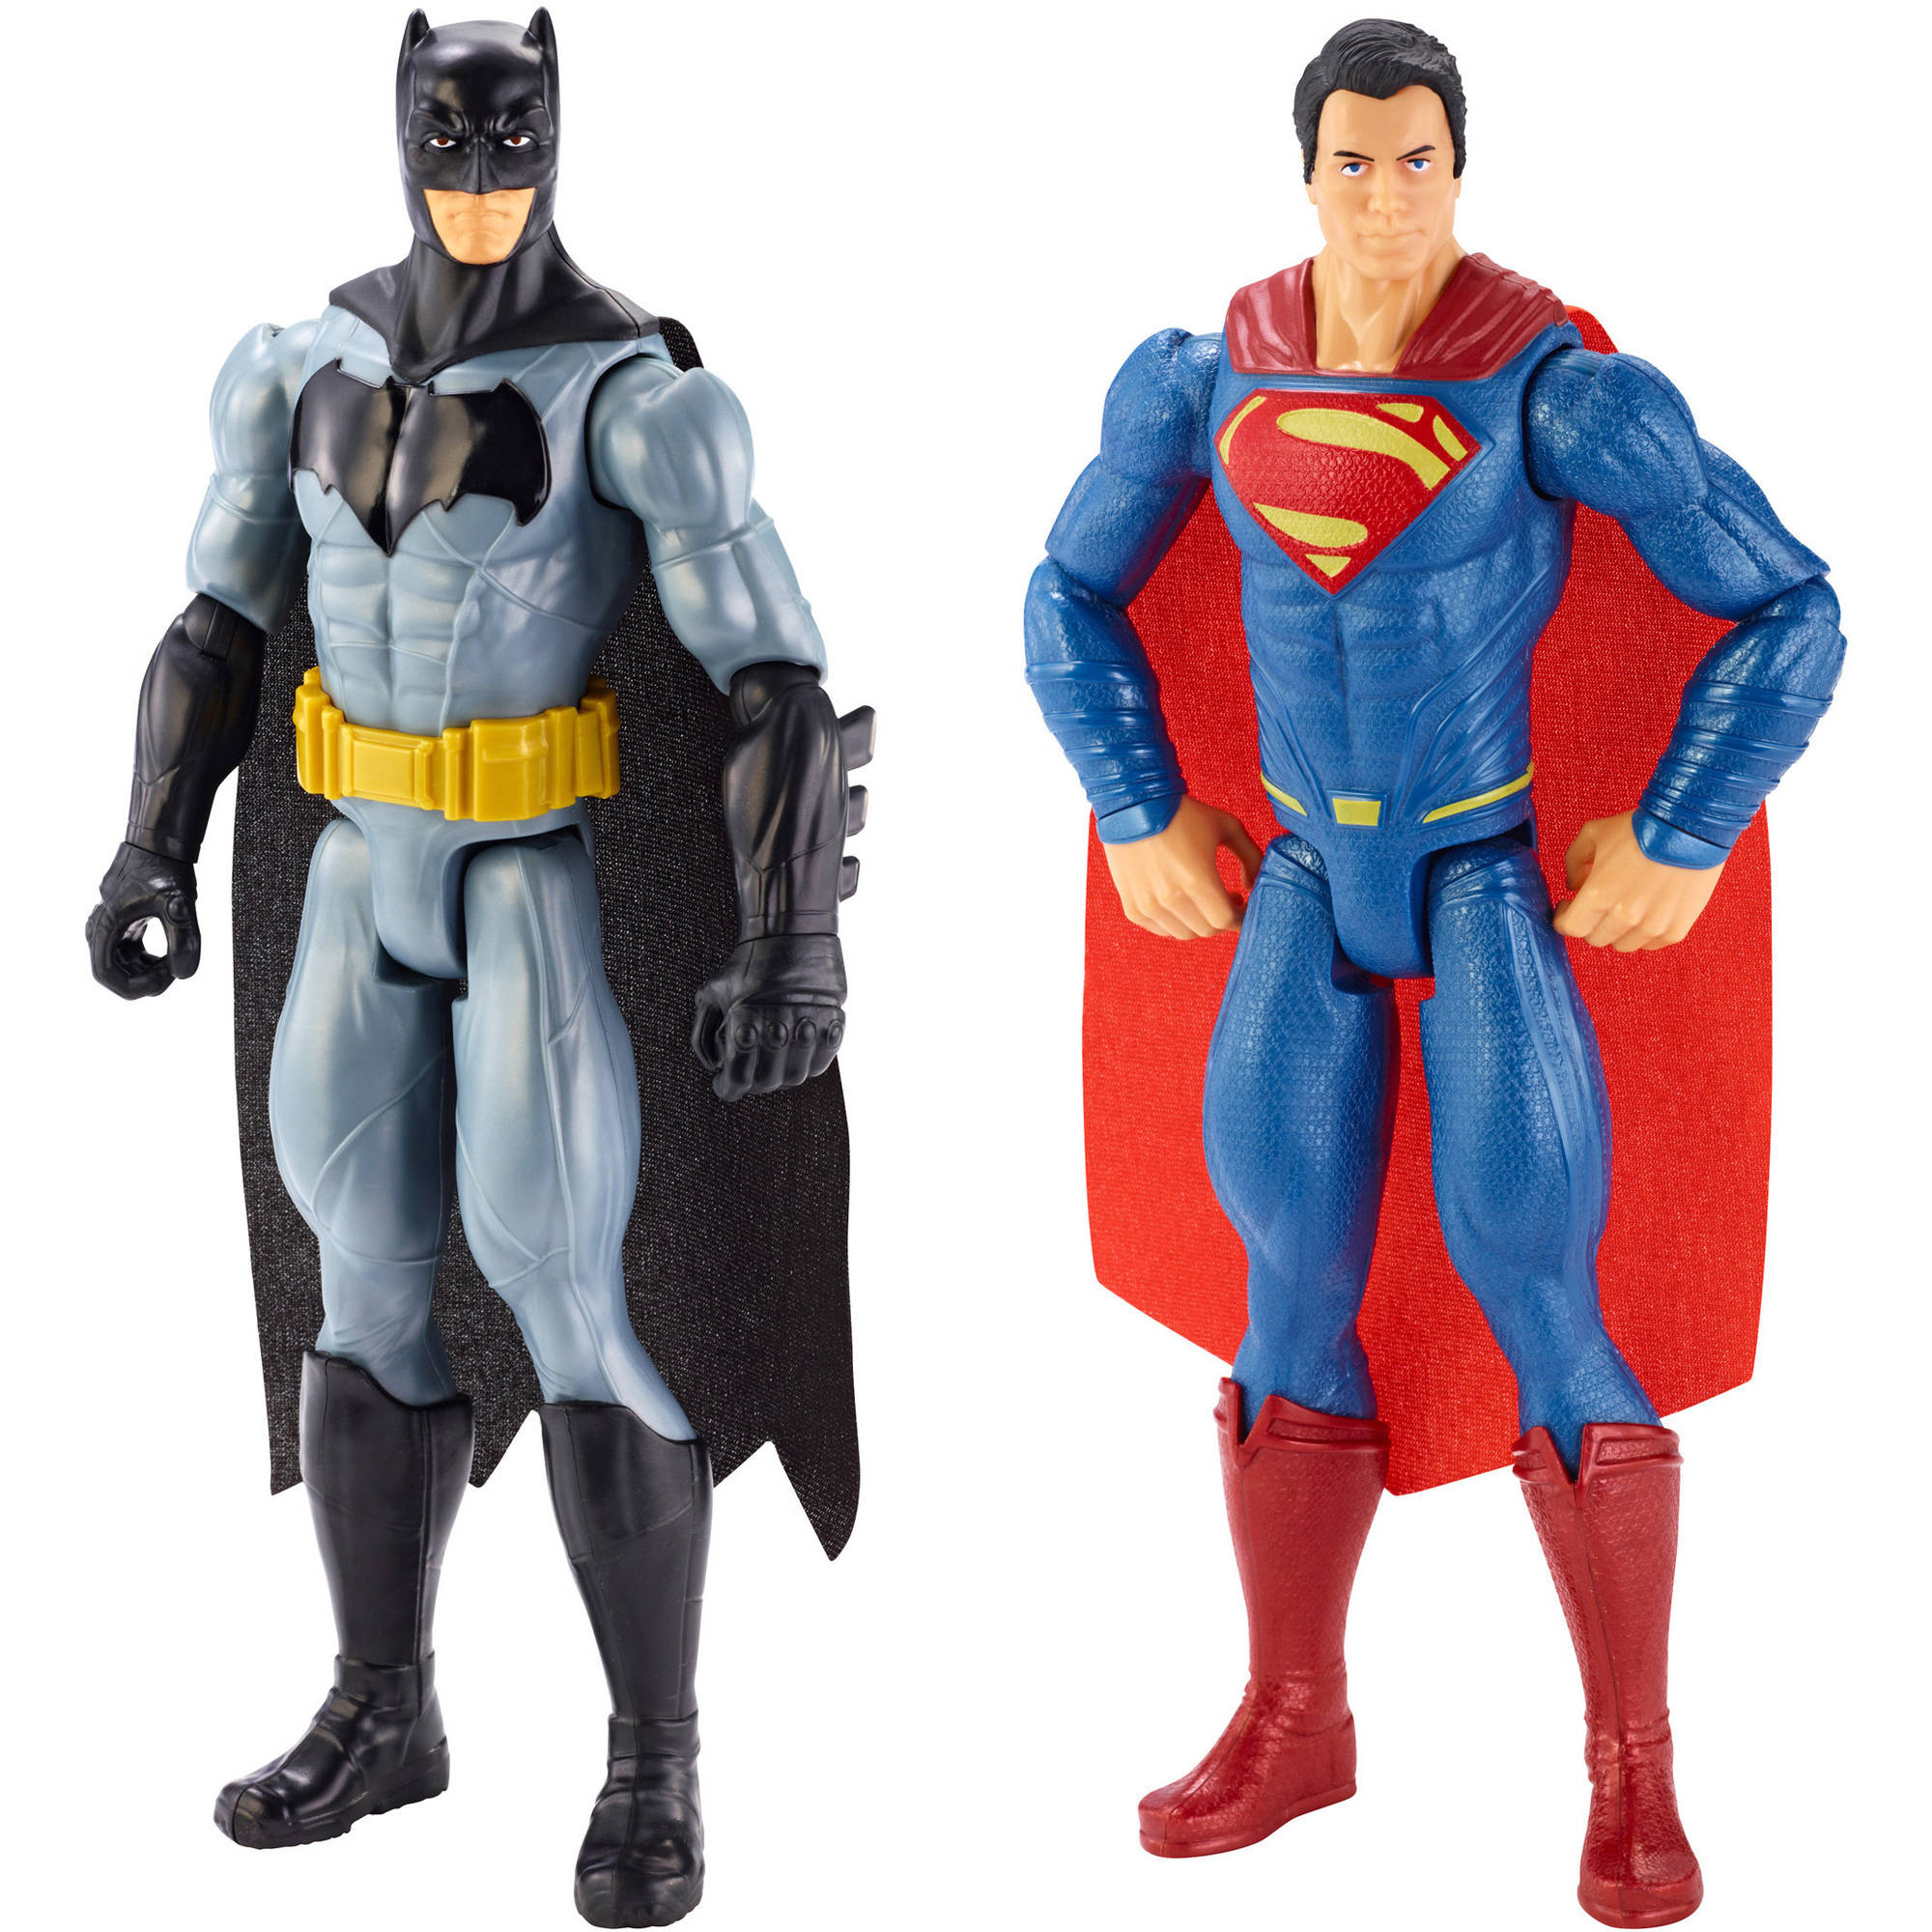 Batman V Superman: Dawn Of Justice Batman & Superman Figure 2-Pack by Mattel